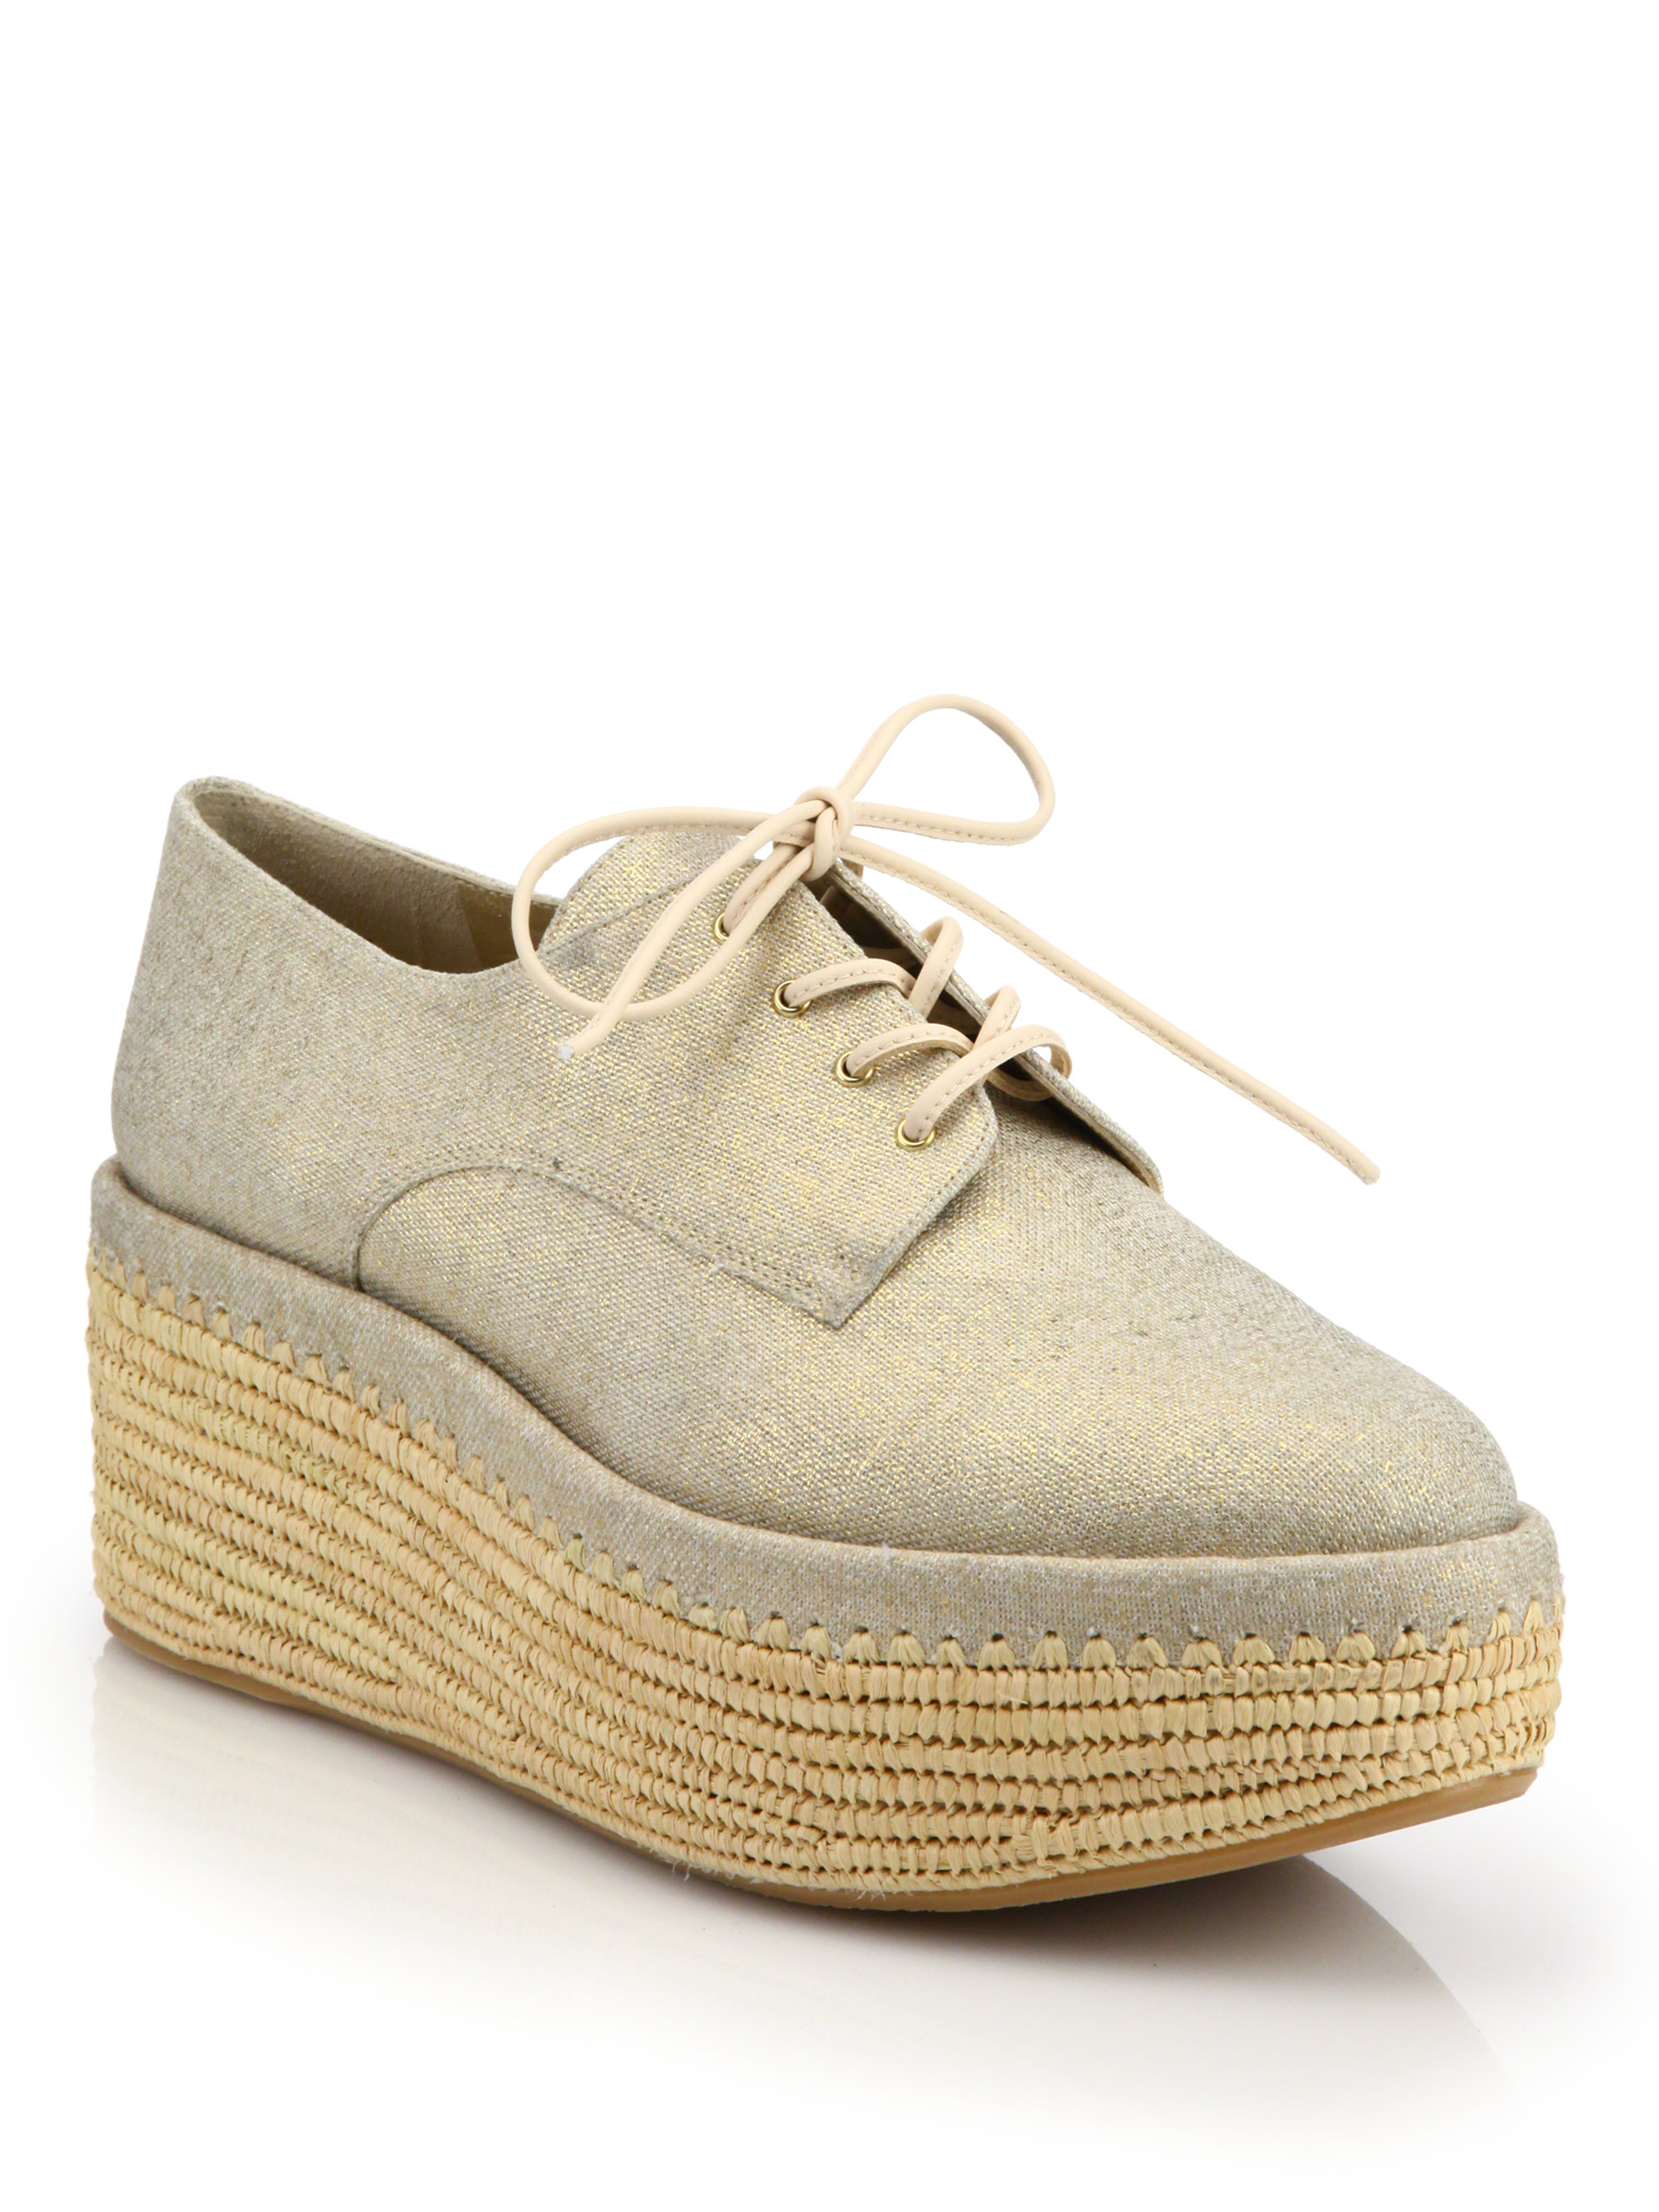 819190bc13c Lyst - Stuart Weitzman Kent Raffia Denim Platform Creeper Shoes in ...